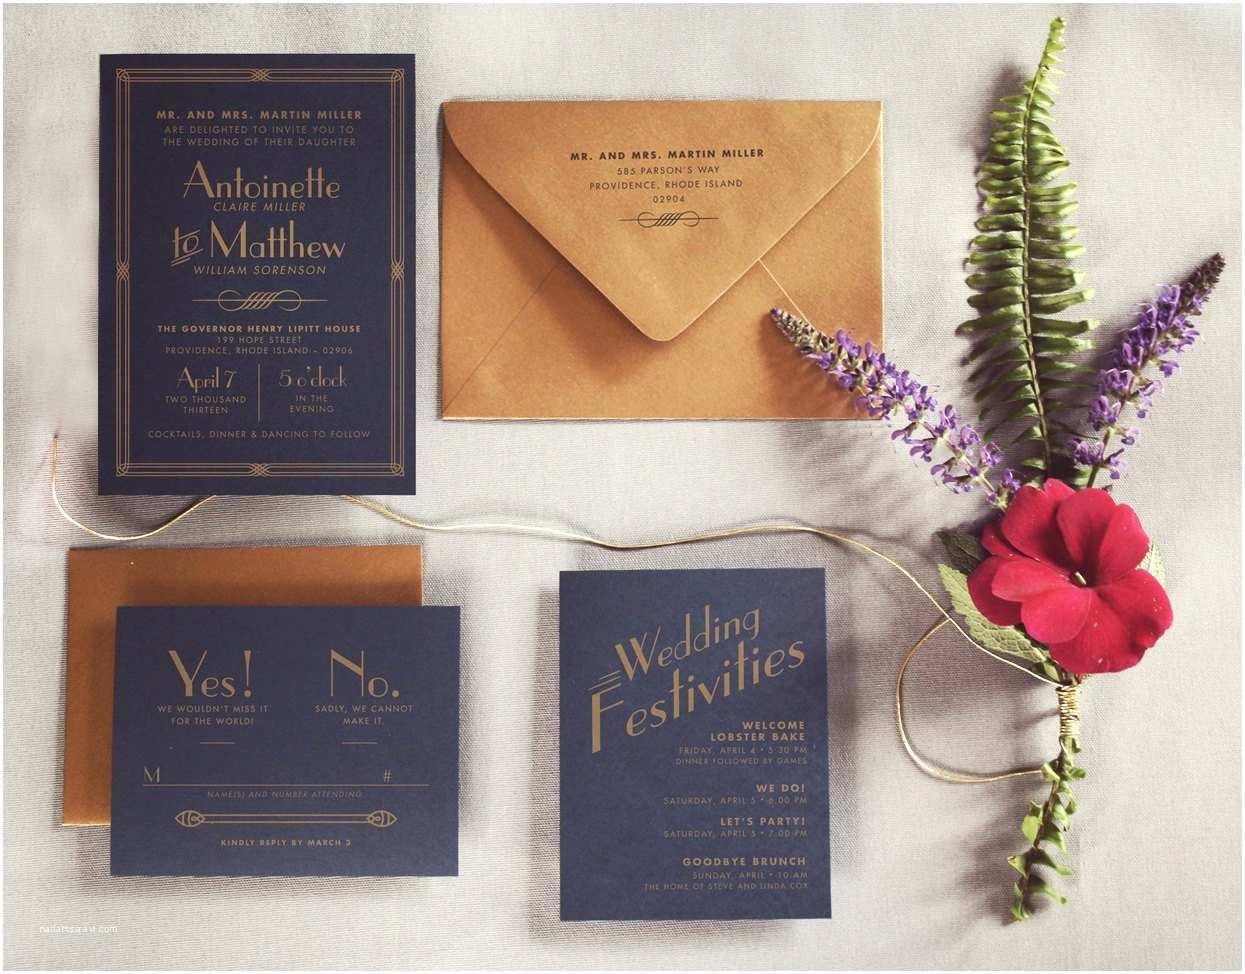 Gatsby Wedding Invitations The Great Gatsby Art Deco Wedding Invitation By